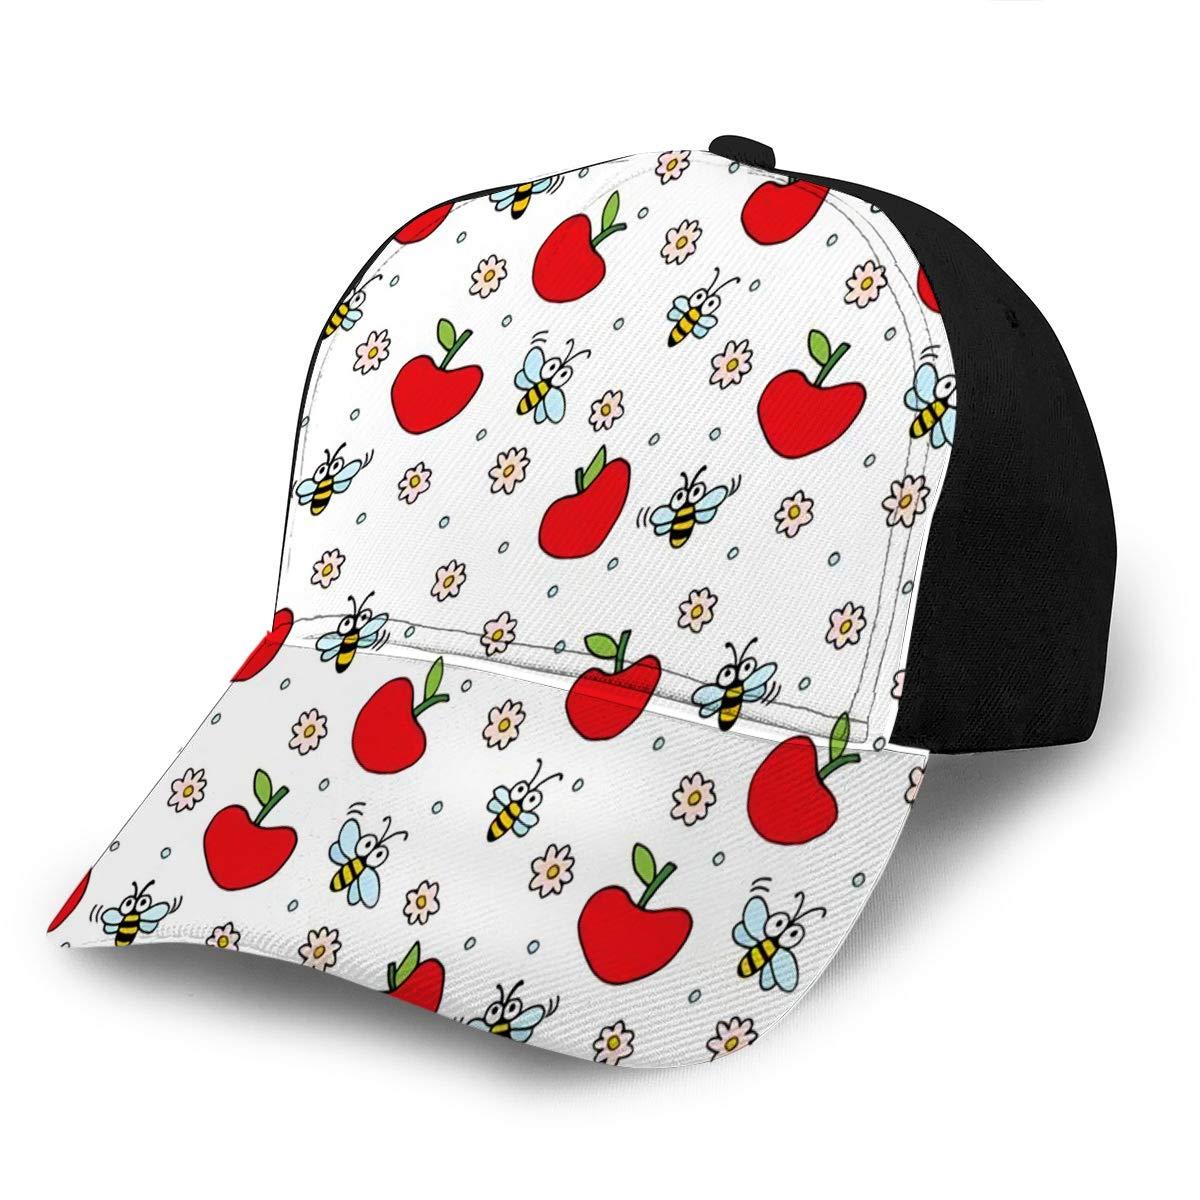 Adjustable Baseball Cap Hats Cartoon Bees Flowers and Apples Fits Men Women Boy